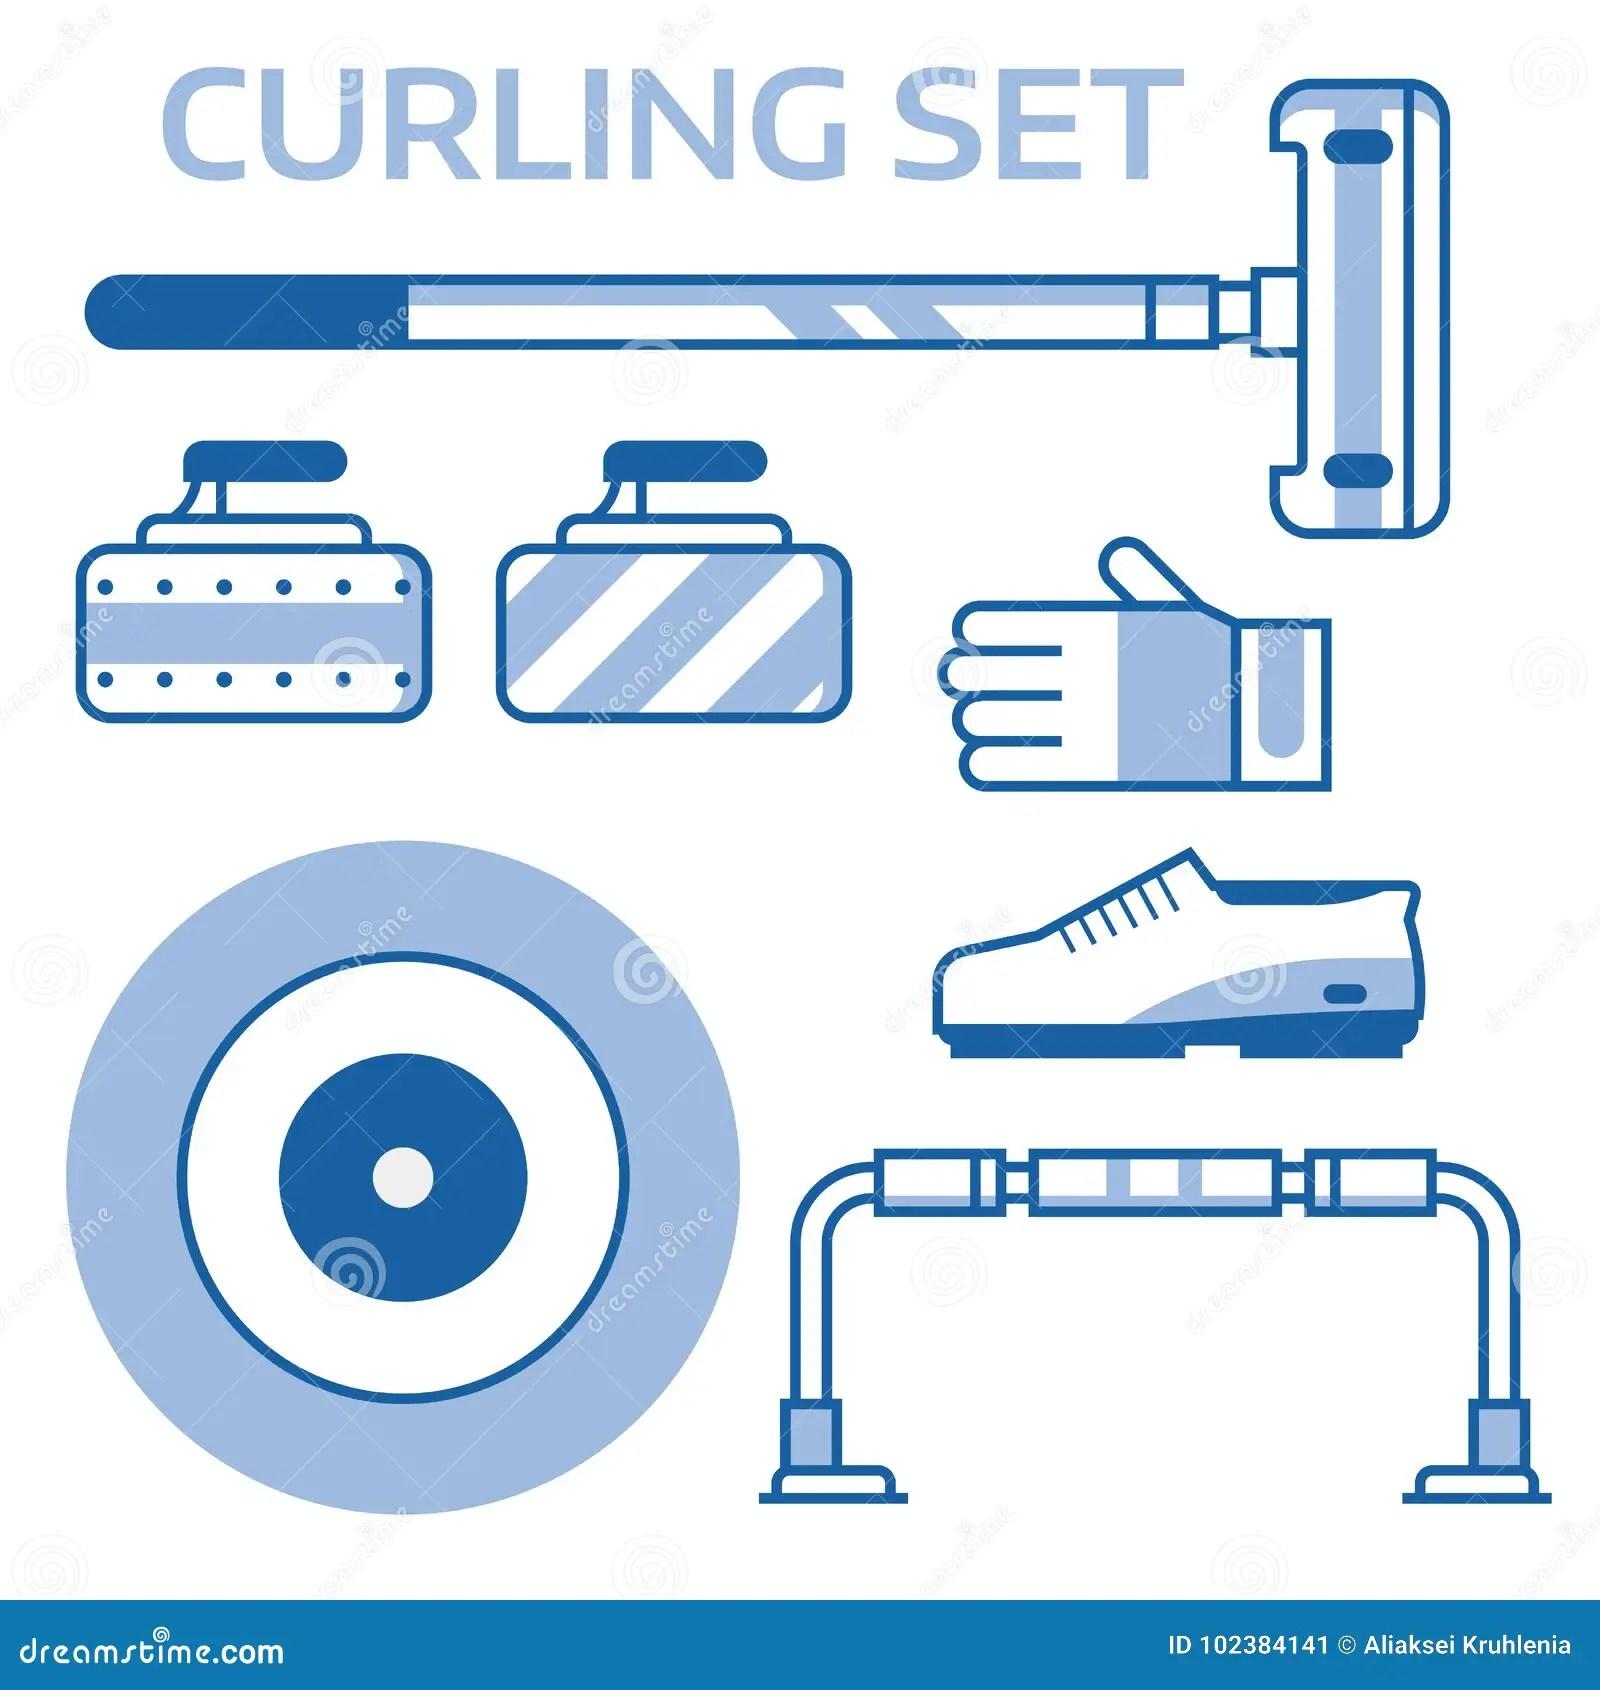 hight resolution of curling equipment diagram house wiring diagram symbols u2022 curling rings diagram curling iron wiring diagram